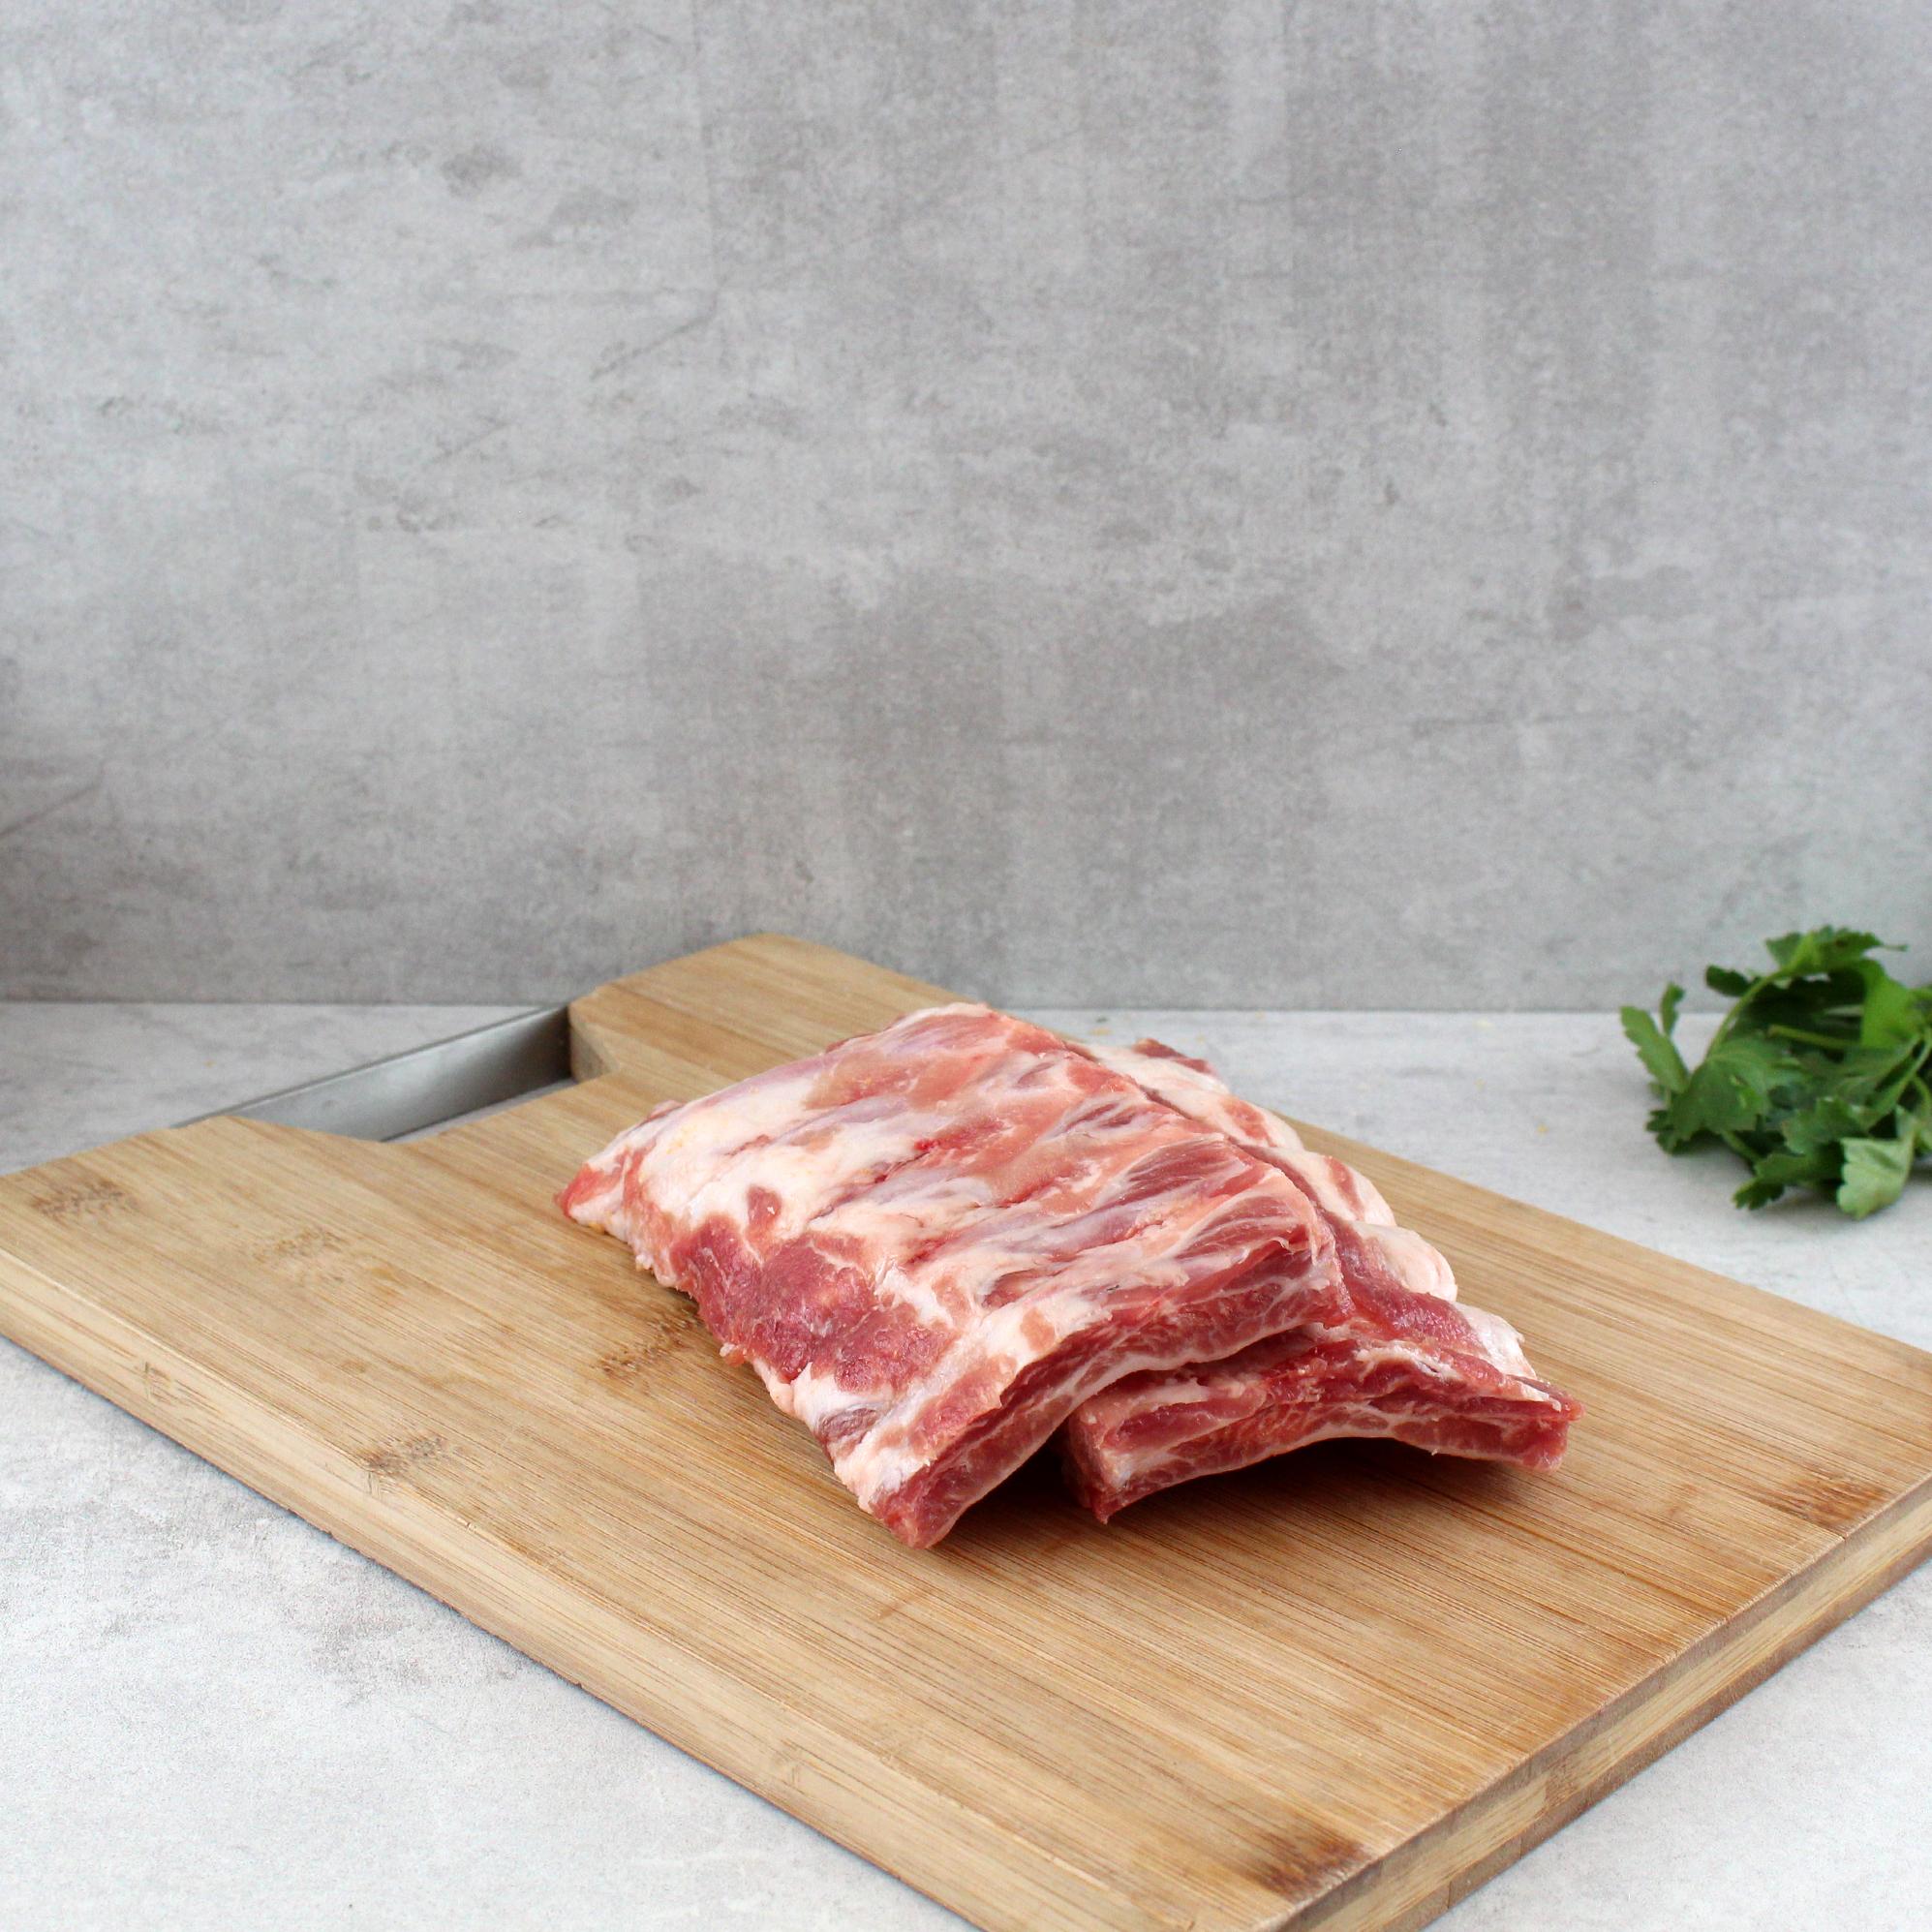 tk-iberico-spare-ribs-ca.-065-kg-st.-3-st.-pae.-markthalle20-1